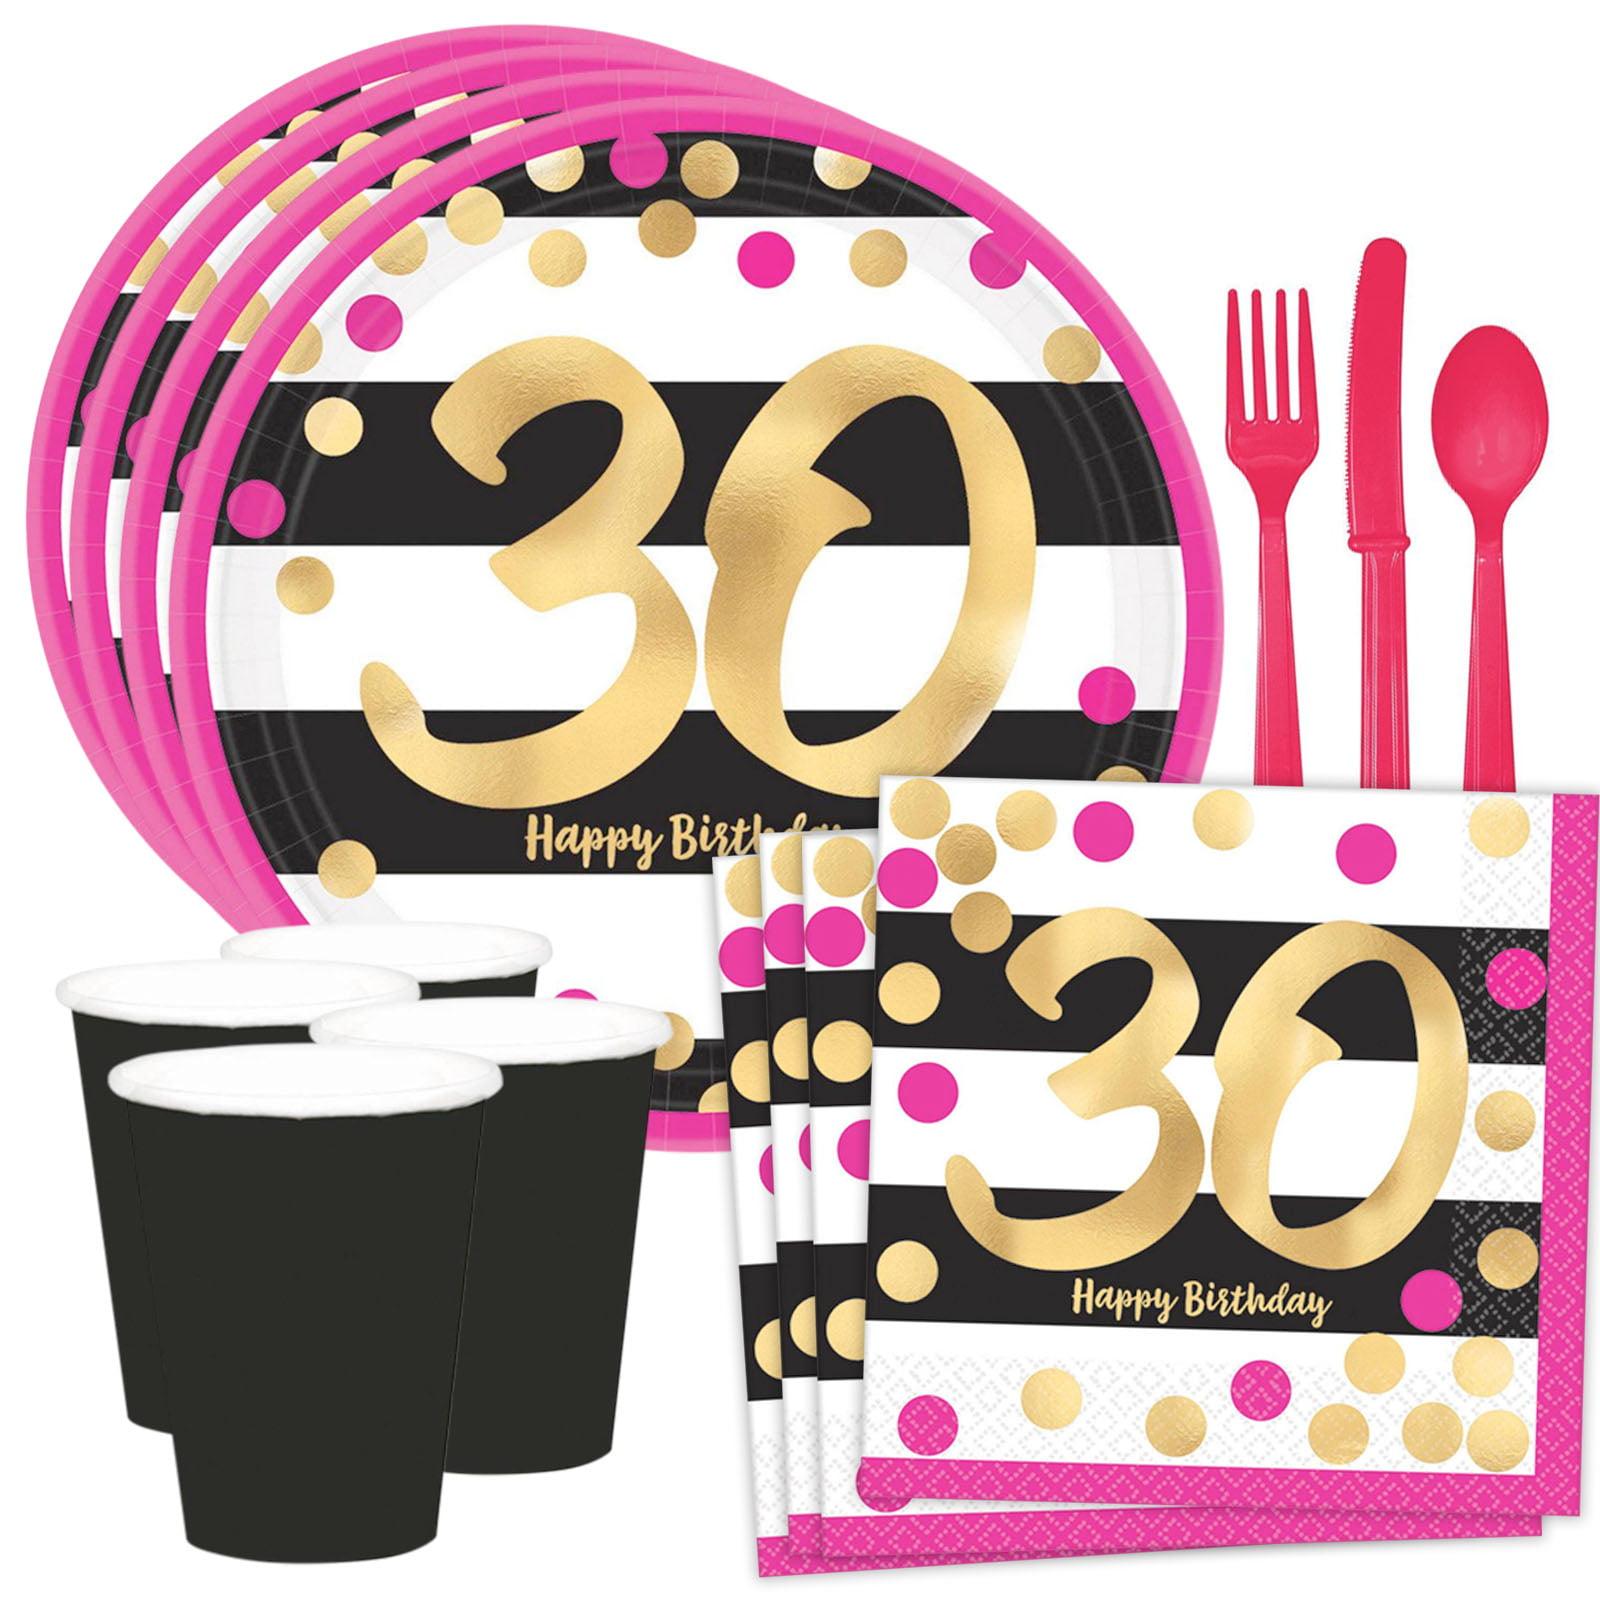 Metallic Pink & Gold 30th Birthday Dessert Standard Tableware Kit (Serves 8)